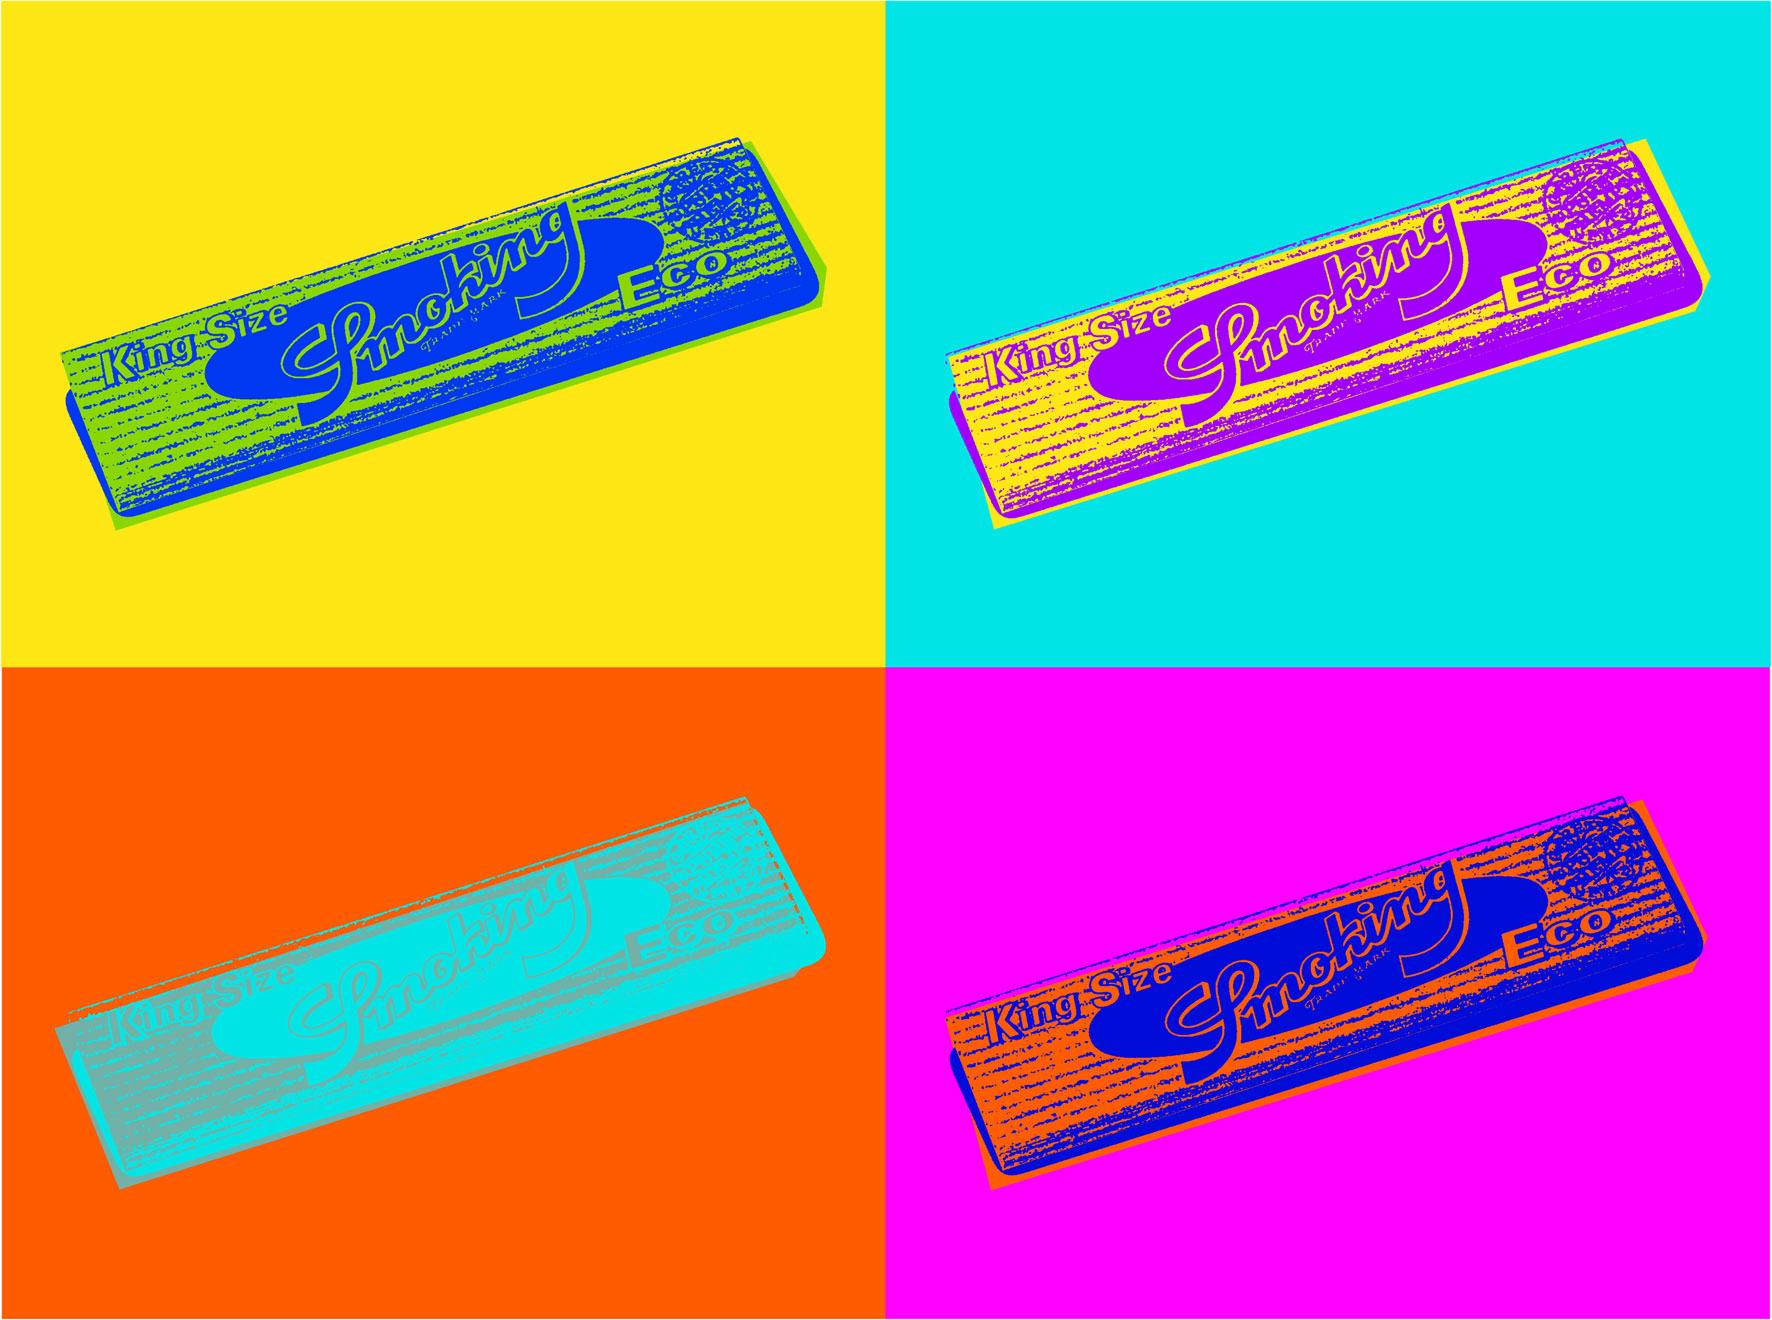 Smoking-Eco-King-Size-Warhol